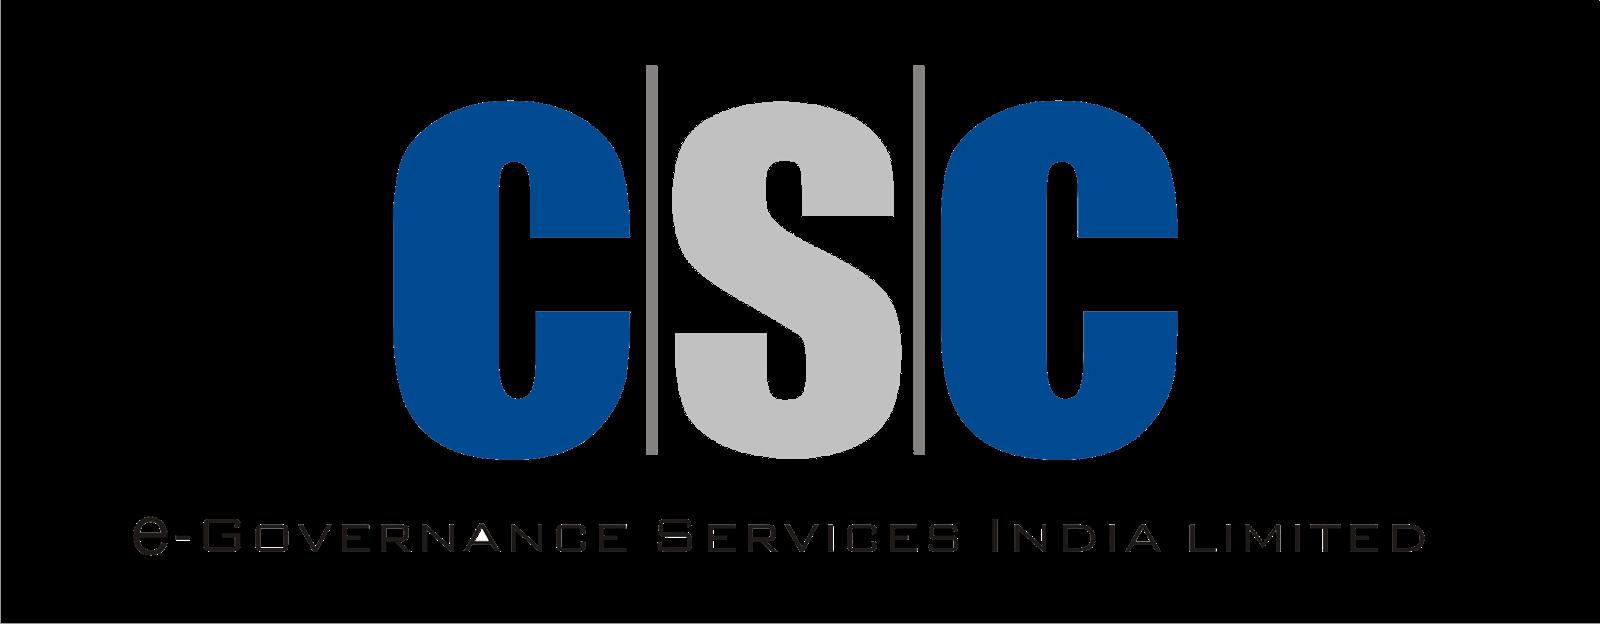 csc_logo Signed Application Form Of Csc on sample scholarship, basic job, sample school, printable employment, blank employment,